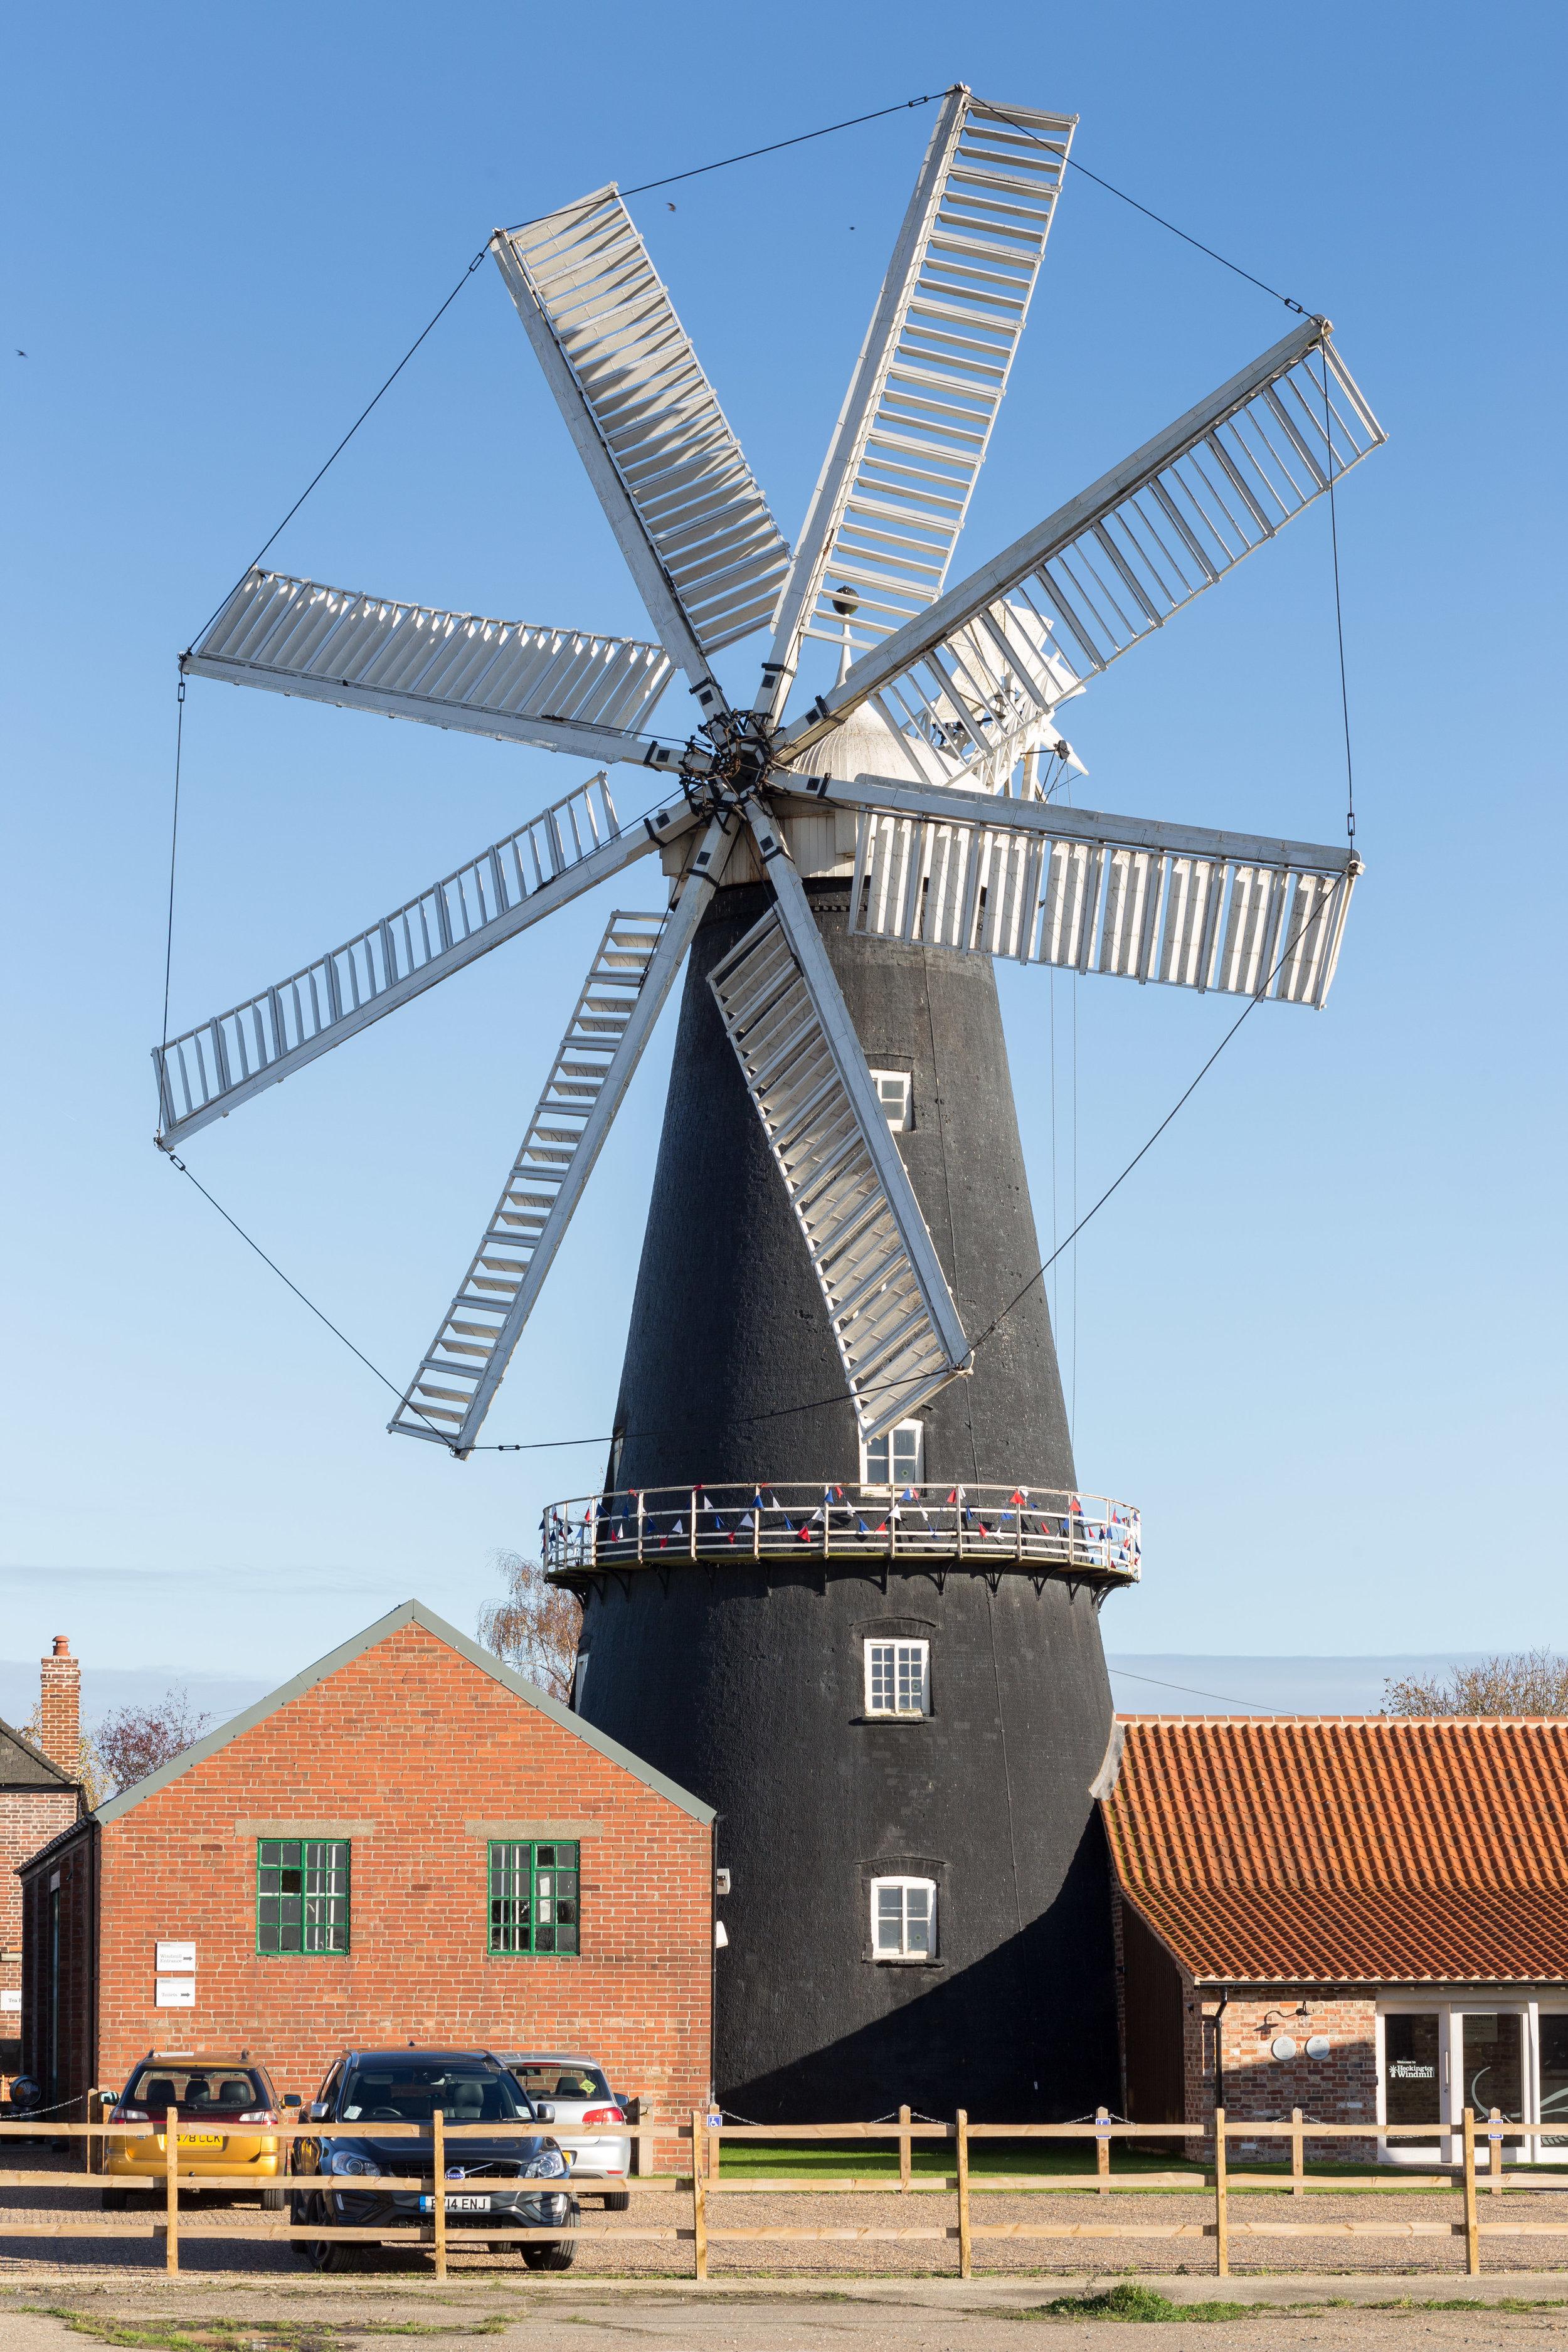 CGA_Heckington Windmill_IMG_8591.jpg